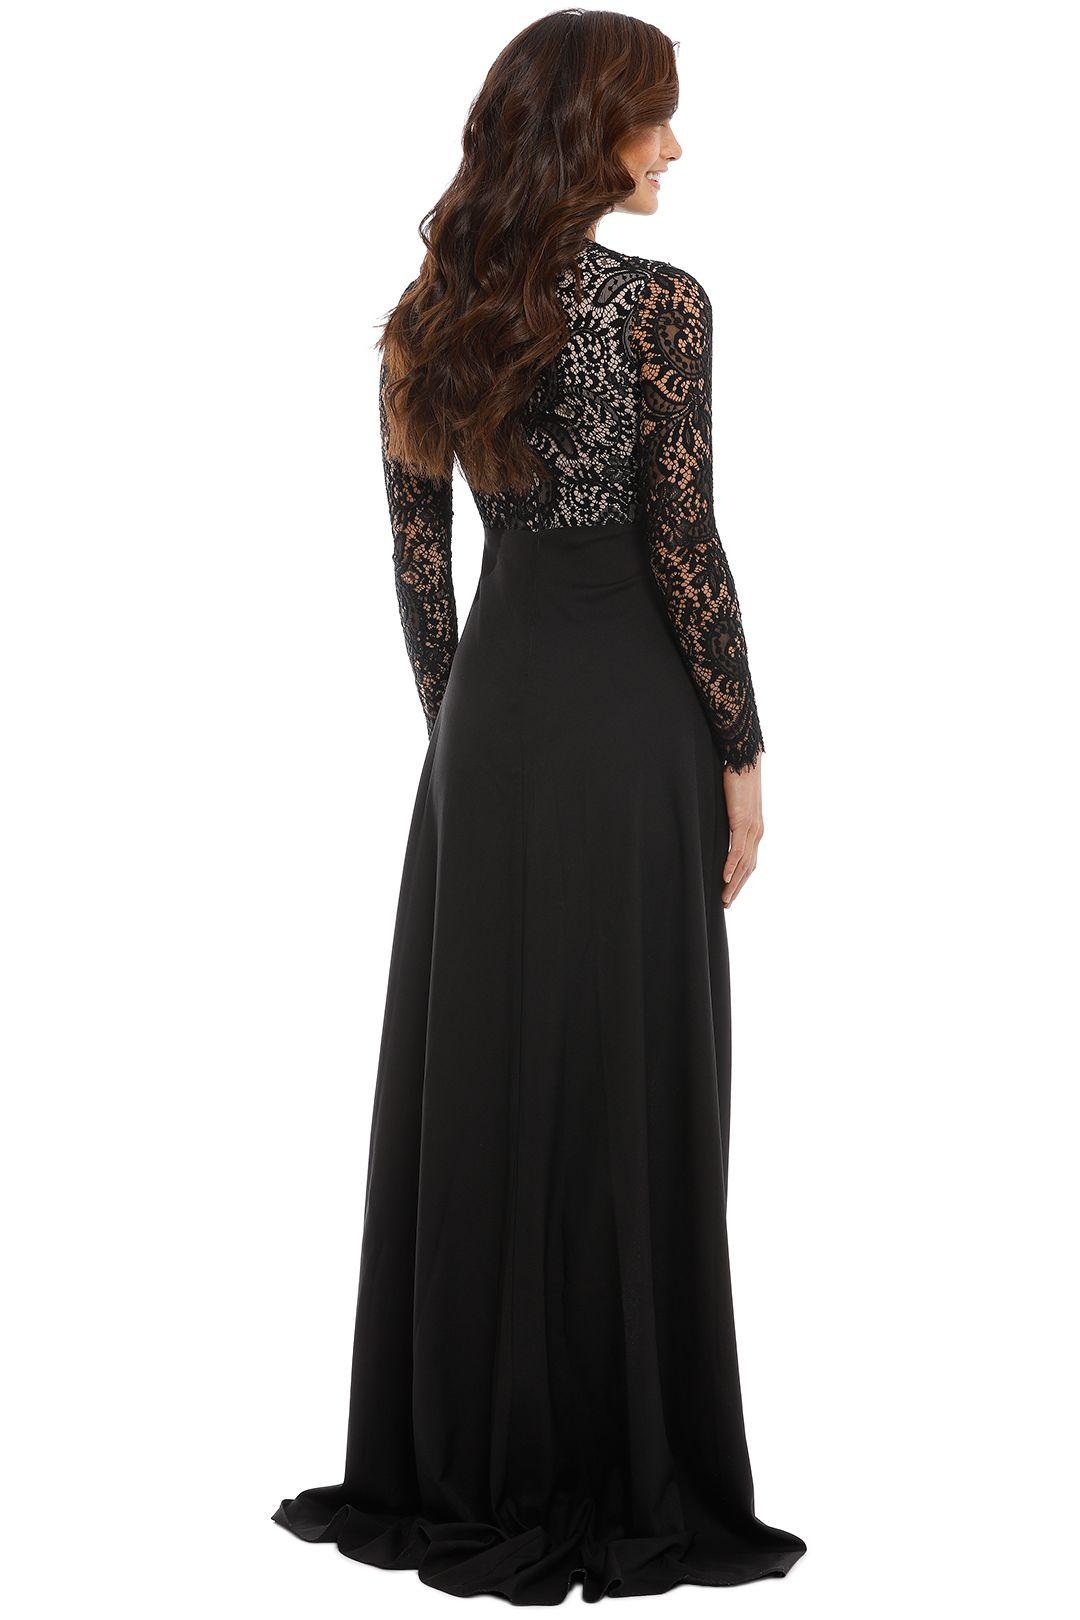 Elle Zeitoune - Alexandria Black Gown - Black - Back